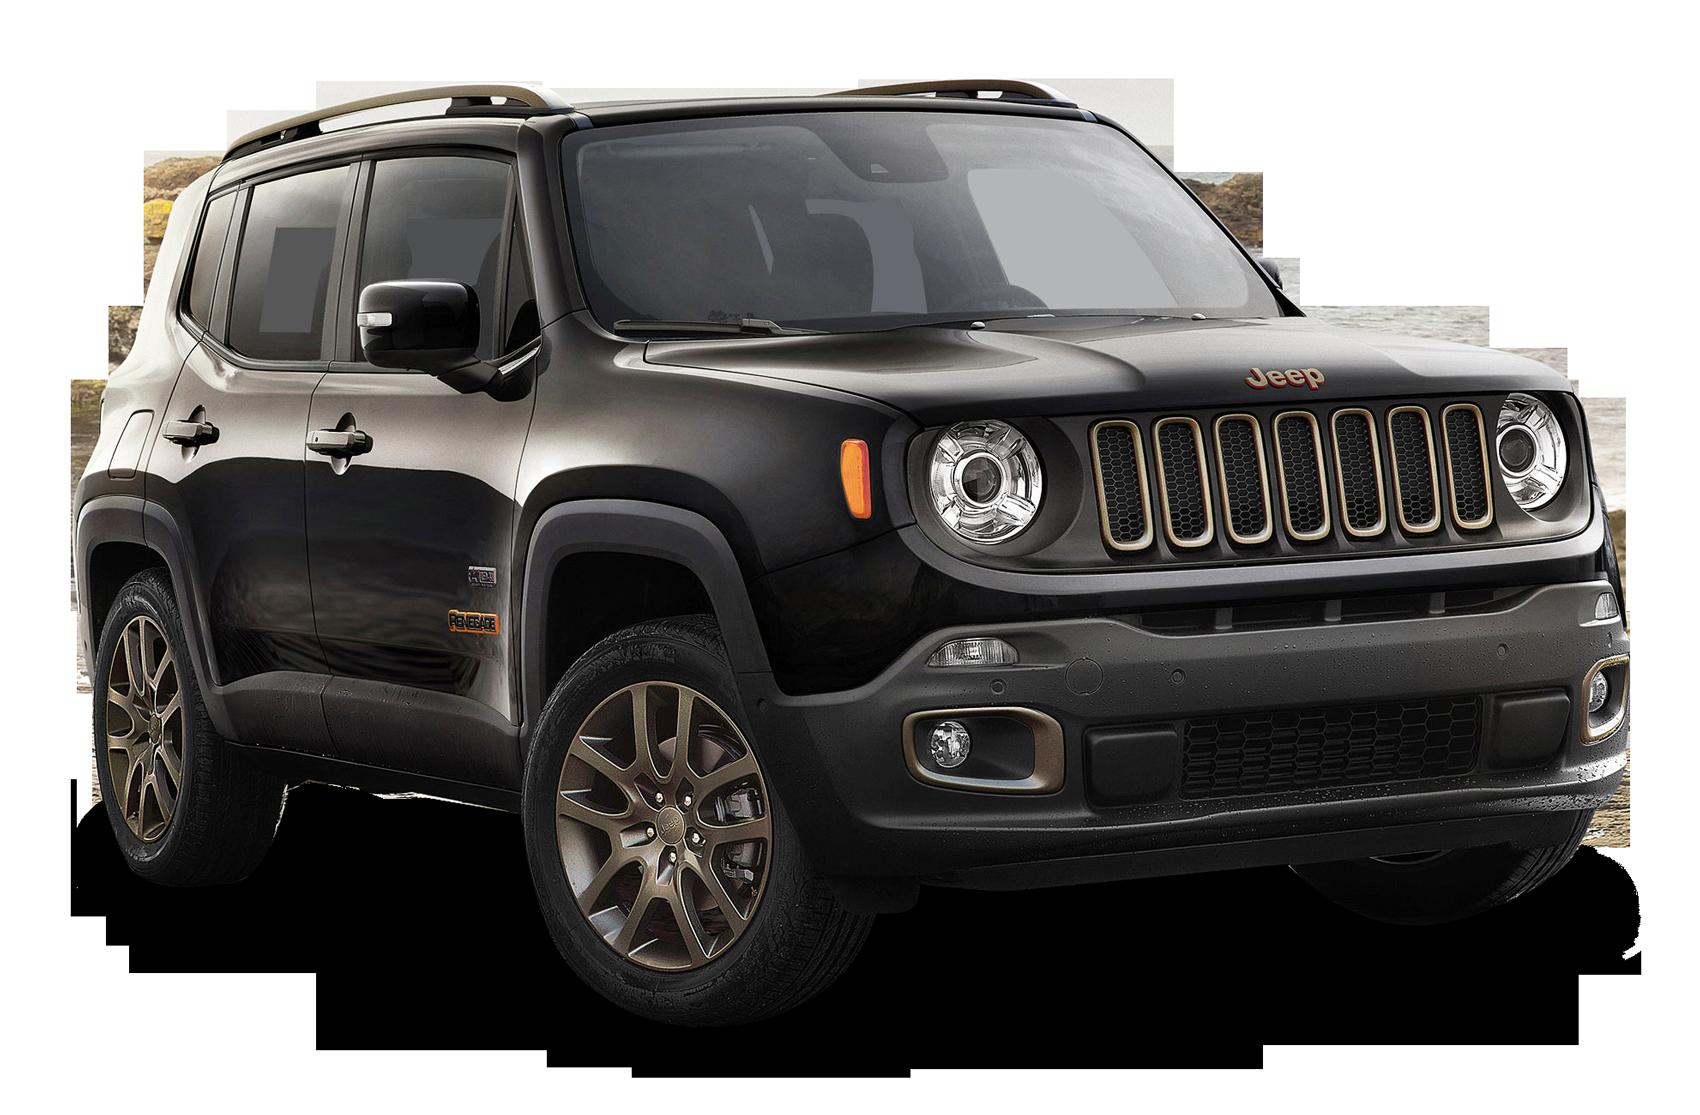 Black Jeep Renegade Car Png Image Black Jeep Jeep Renegade Jeep Renegade Black